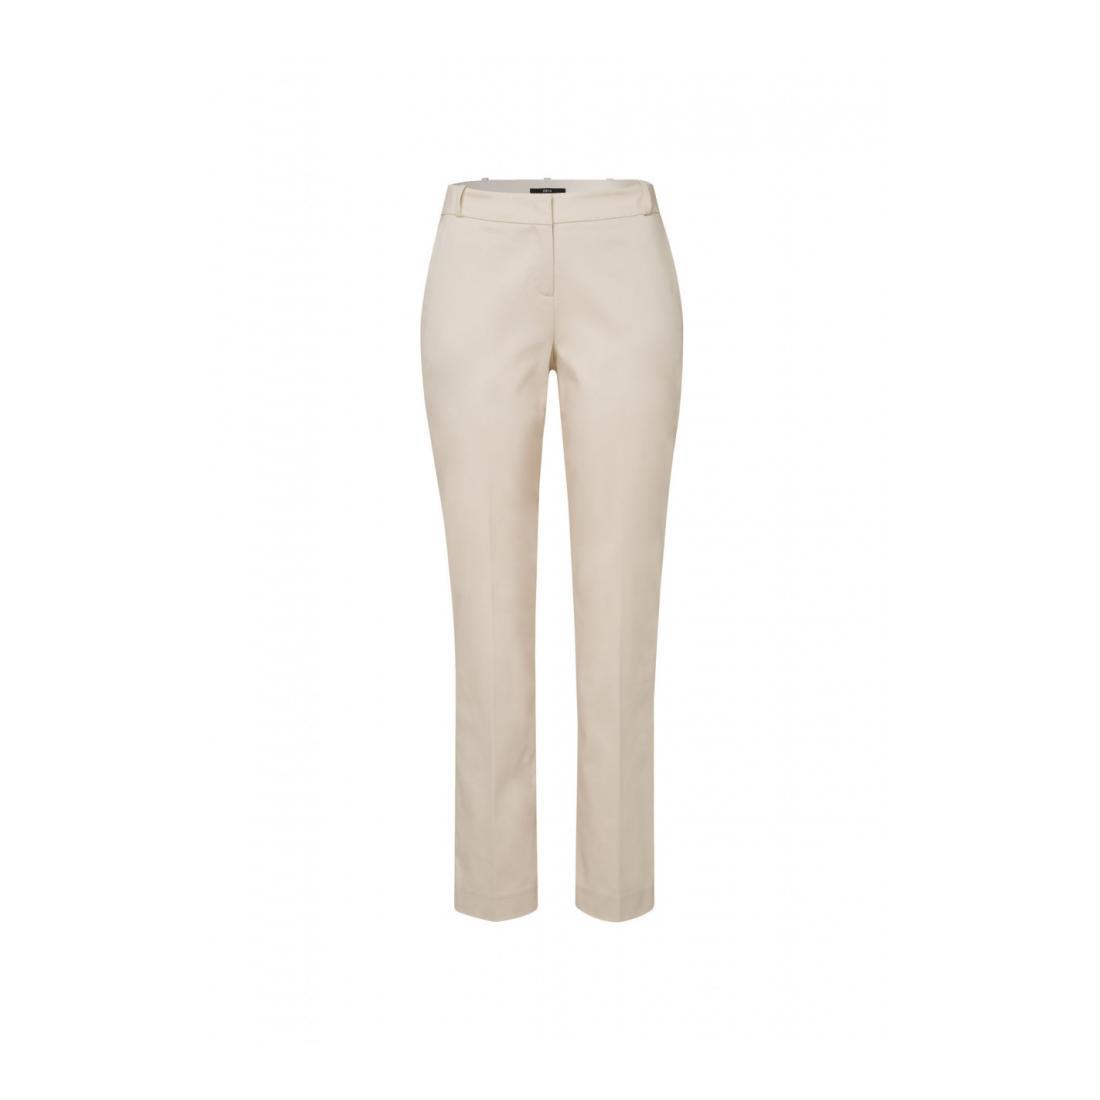 Zero Joggingpants/Leggins Damen Pants woven straight 32 i